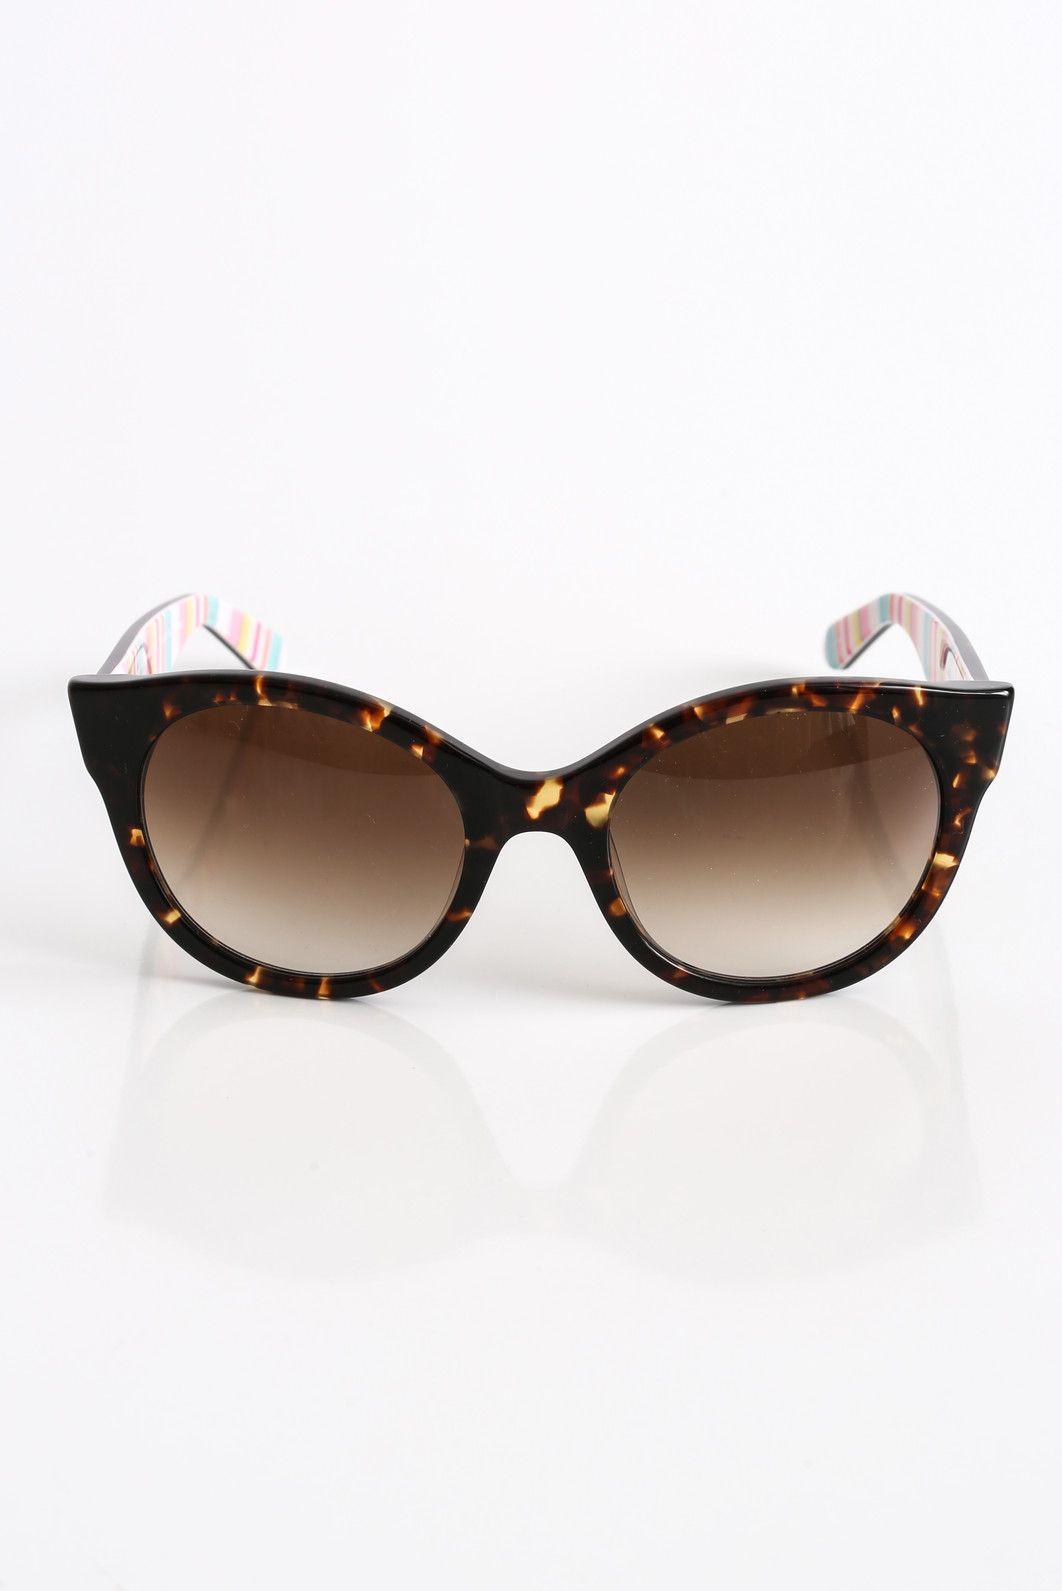 aa43984373 Kate Spade Melly Round Havana Sunglasses